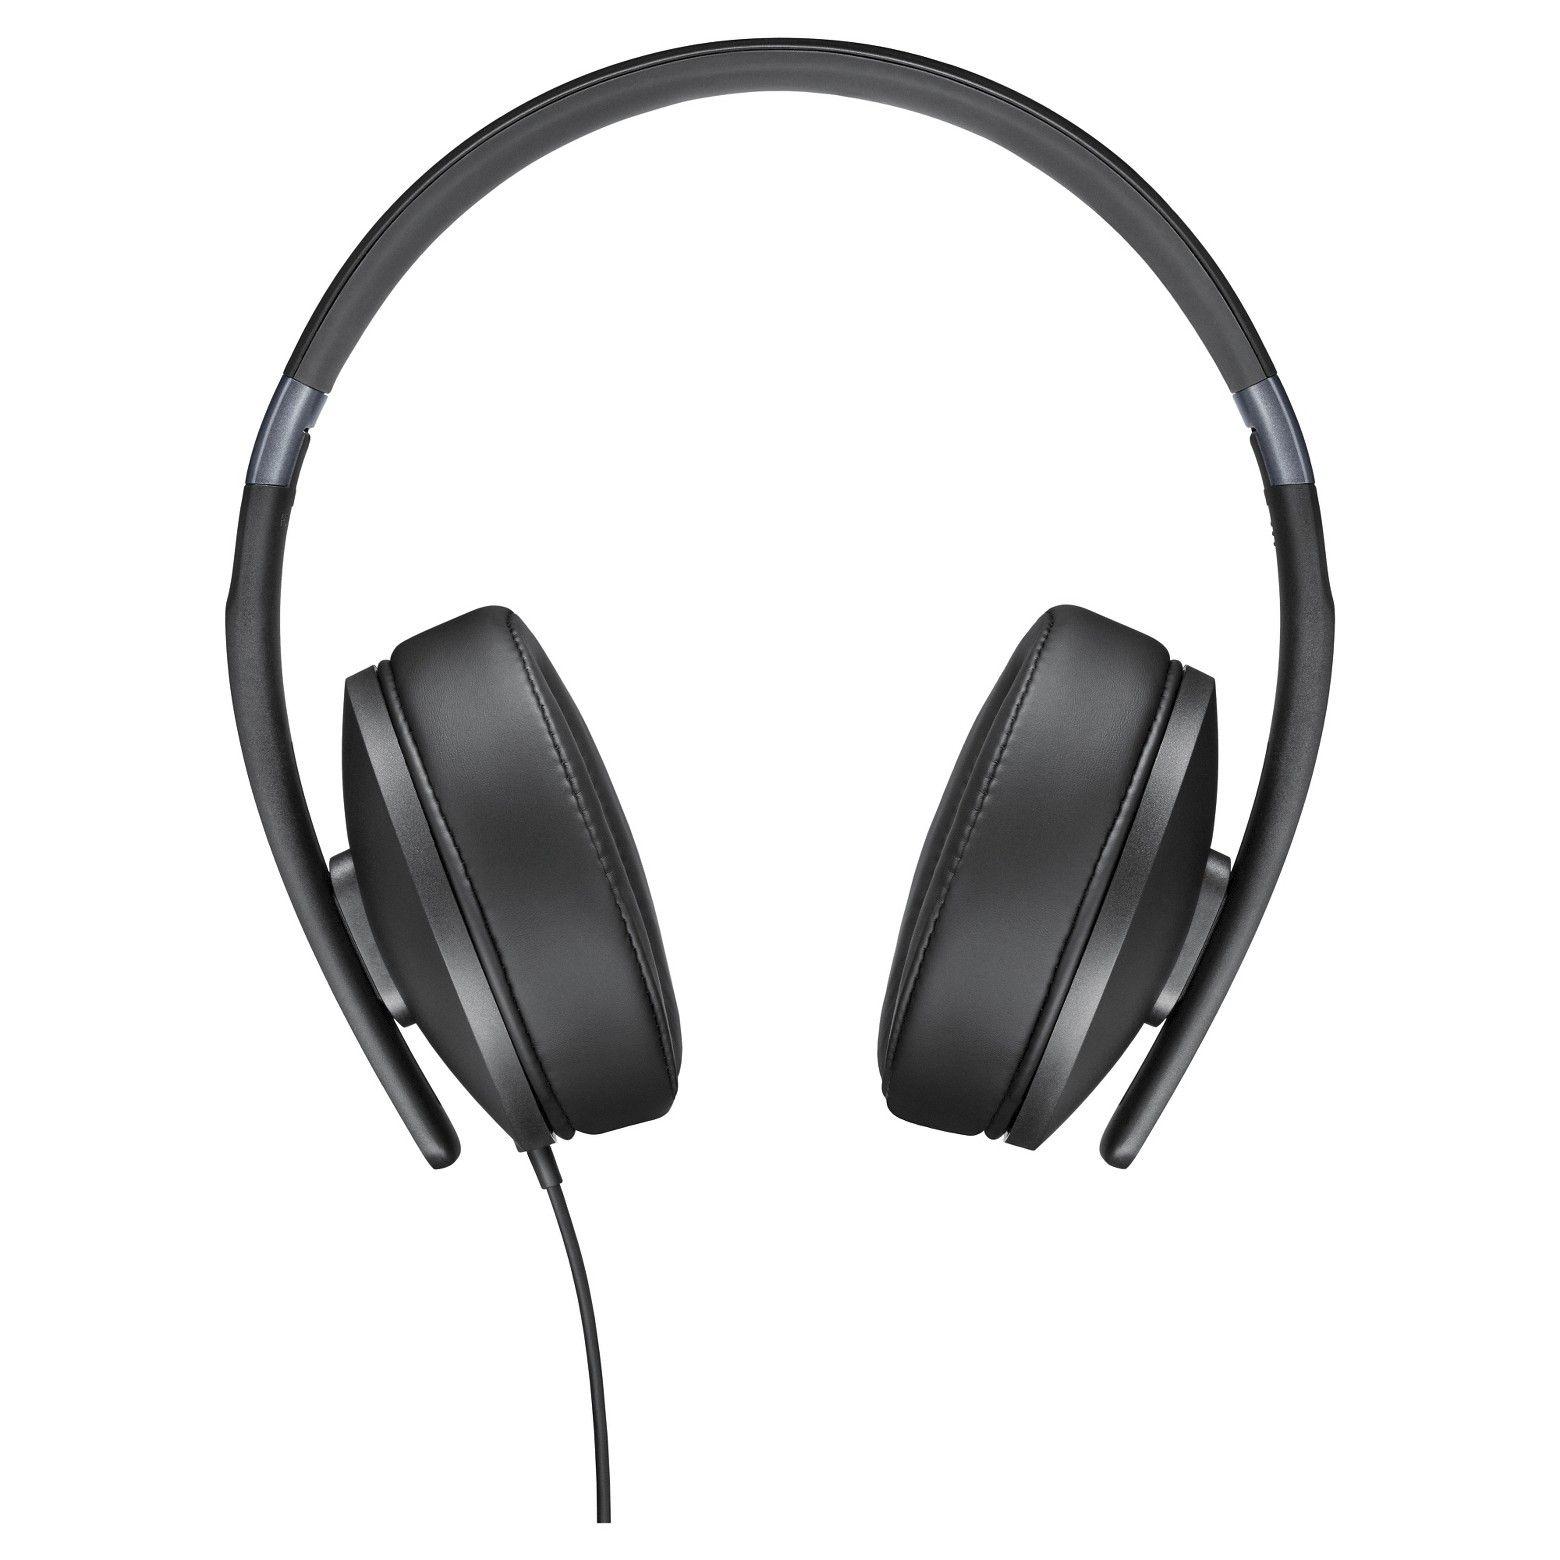 Sennheiser's new HD4.20s Black AroundEar headset features